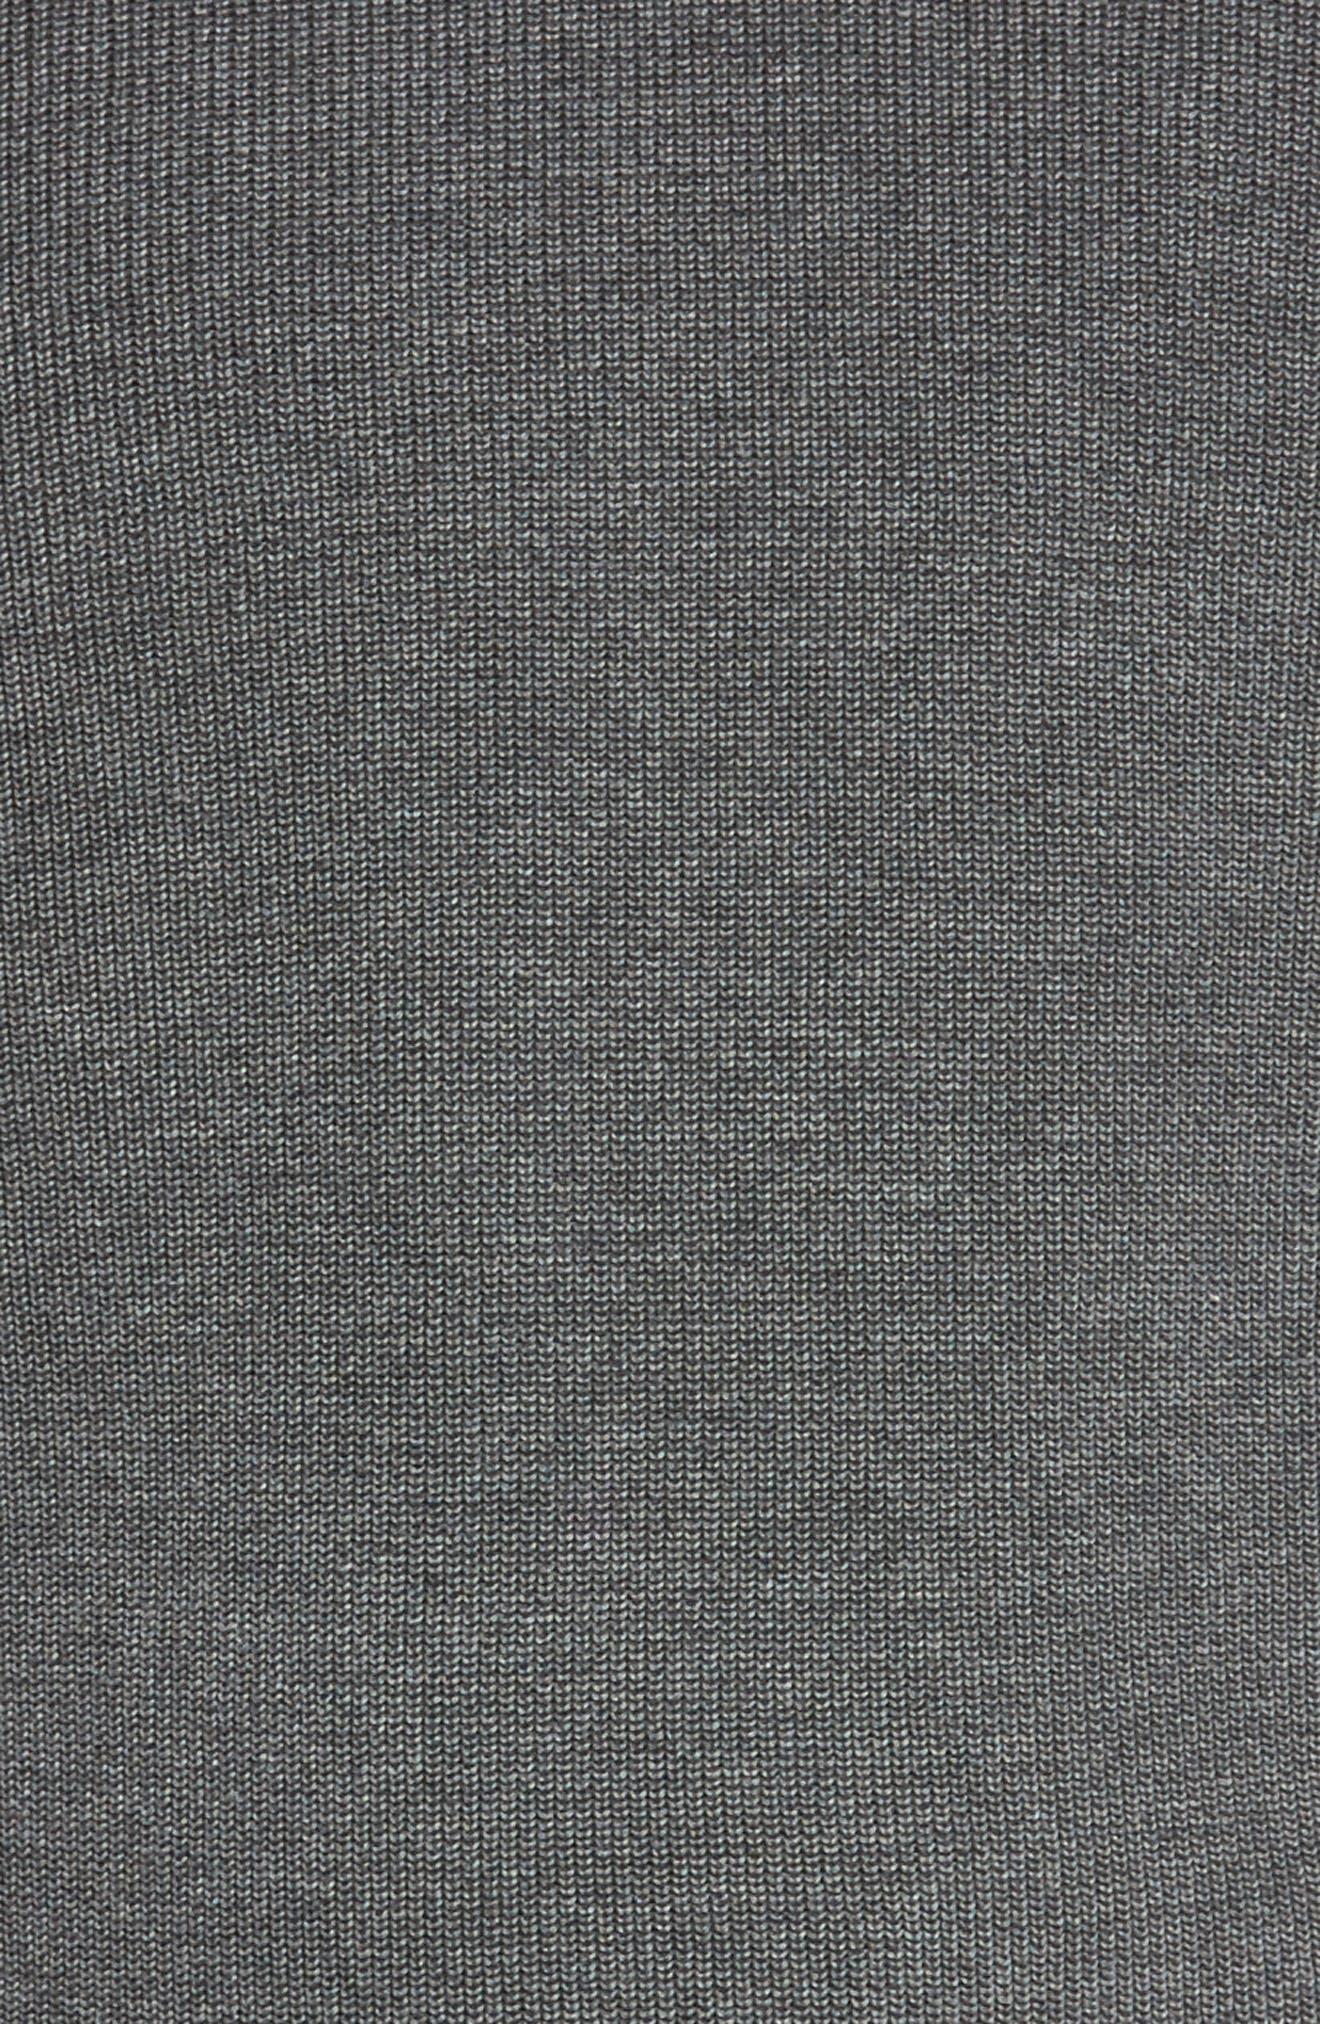 Las Palmas Reversible Sweater,                             Alternate thumbnail 4, color,                             Charcoal Heather